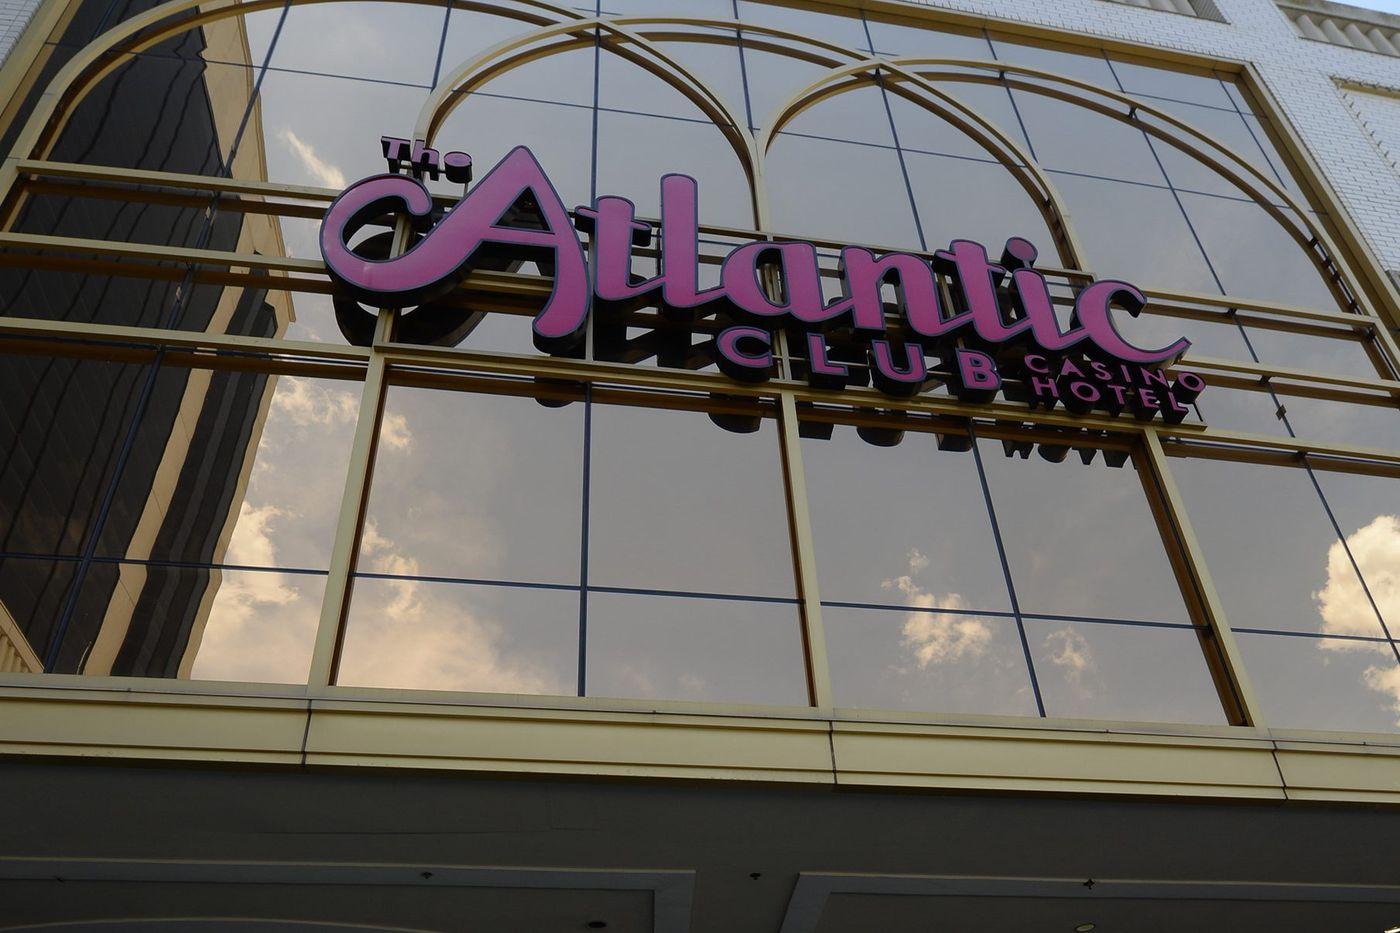 Deal for Stockton to buy empty Atlantic Club property falls through